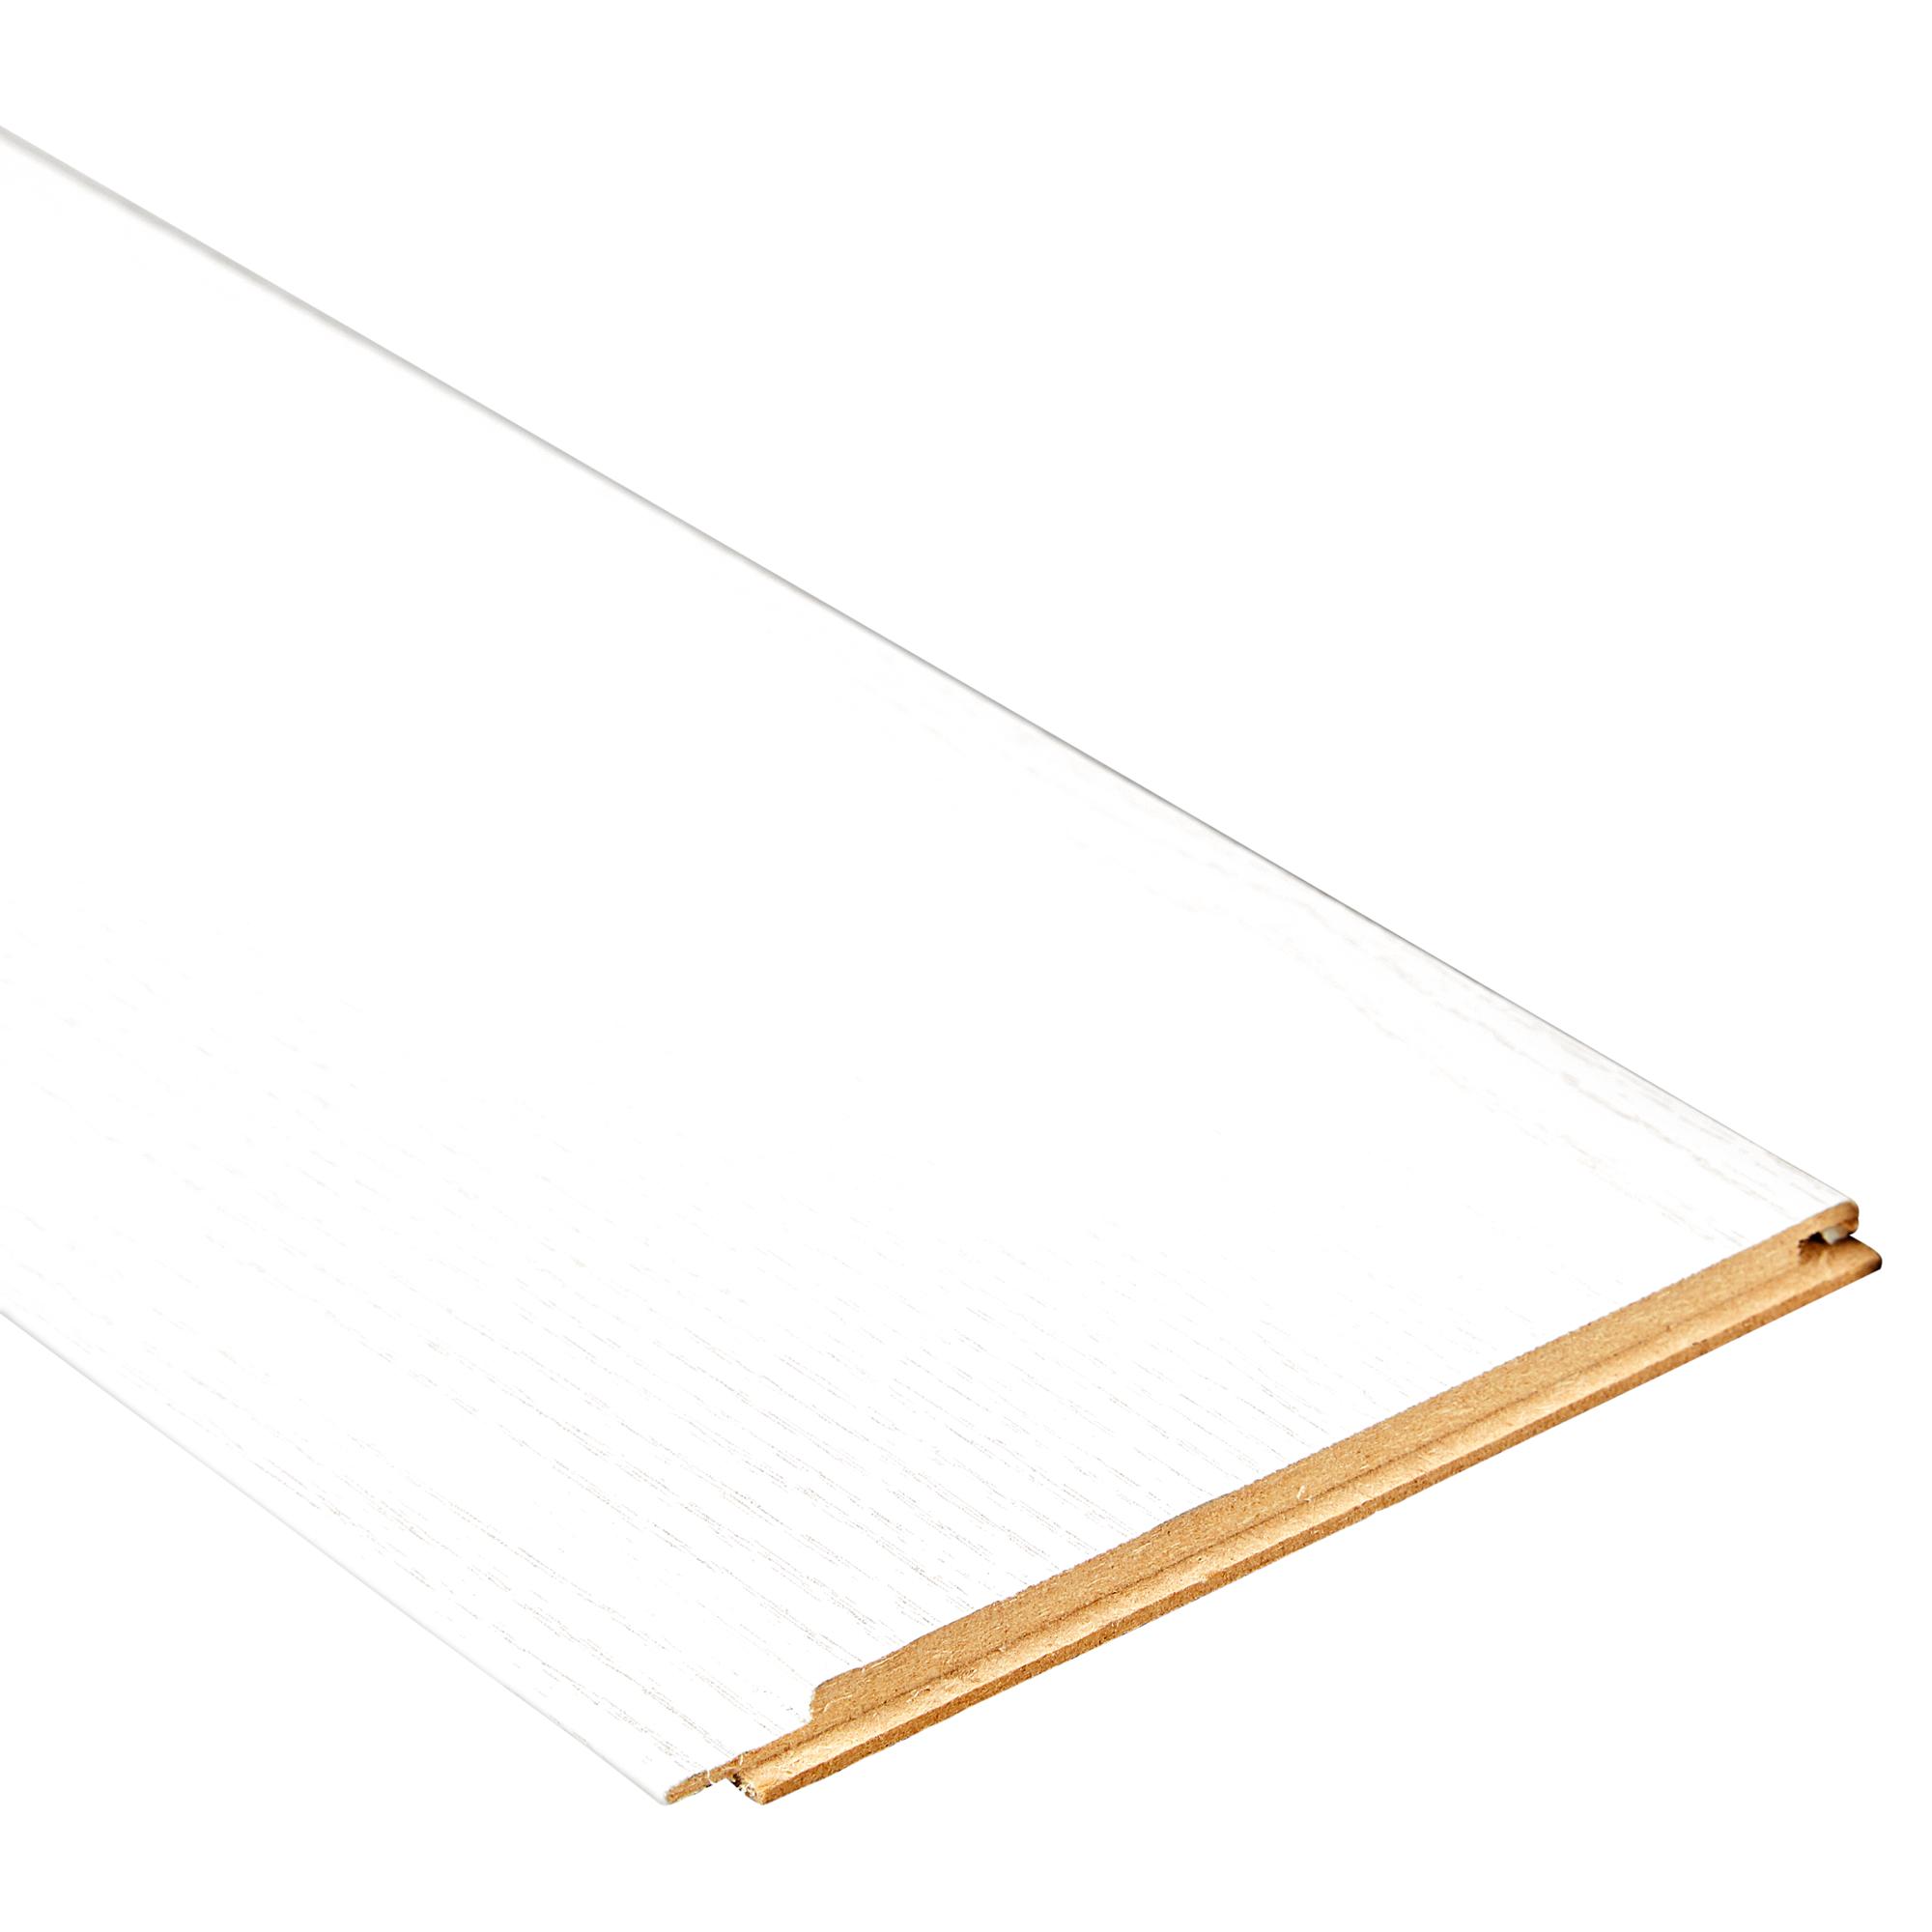 Bevorzugt B1 Paneele Esche weiß 260 x 15 x 0,8 cm 7 Stück ǀ toom Baumarkt JA26